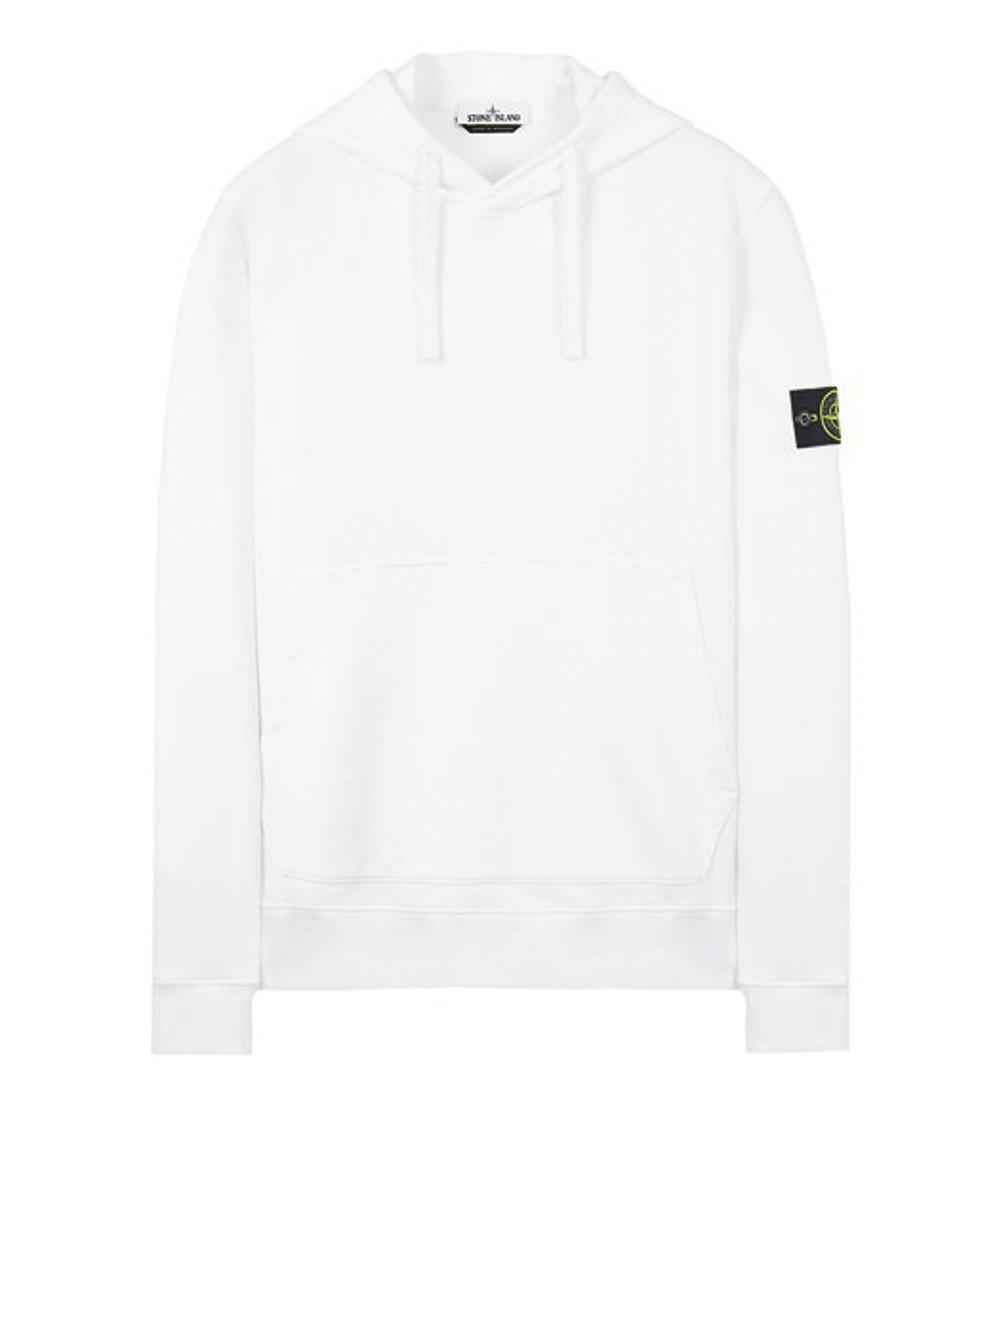 STONE ISLAND Μπλούζα φούτερ με κουκούλα MO751564120-V0001 ΛΕΥΚΟ